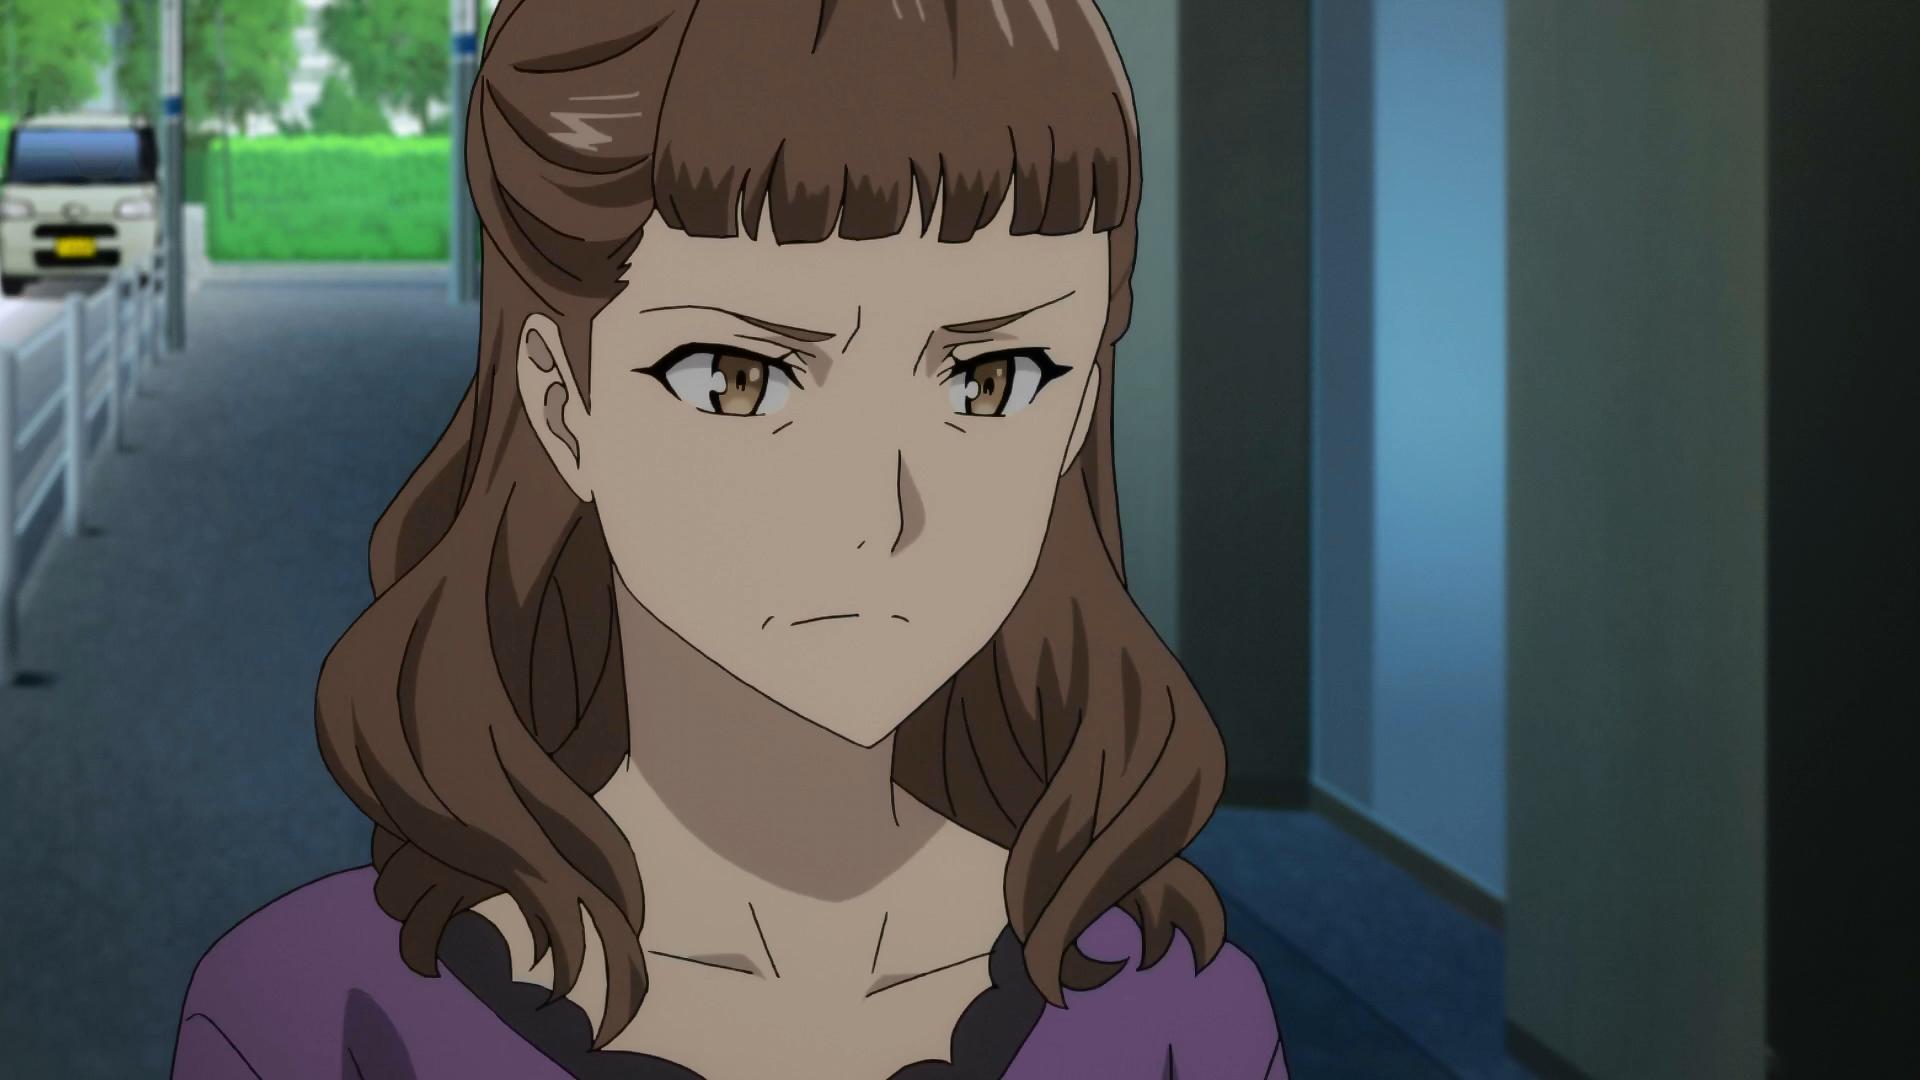 Nodoka's mother